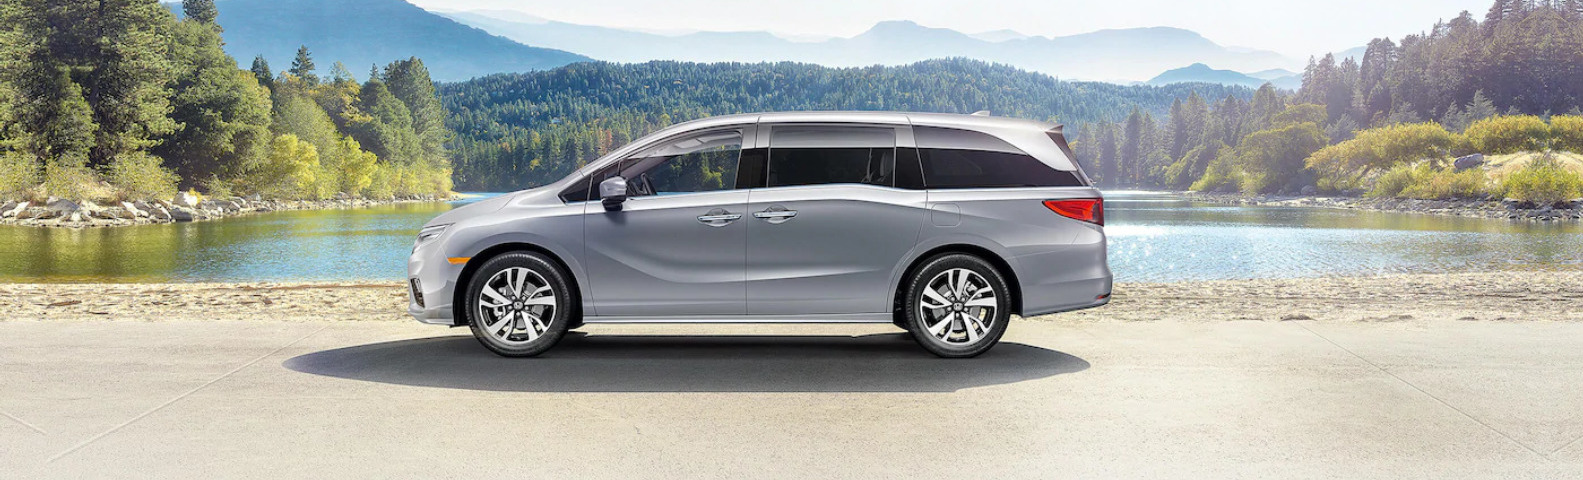 2020 Honda Odyssey Lease near Ann Arbor, MI